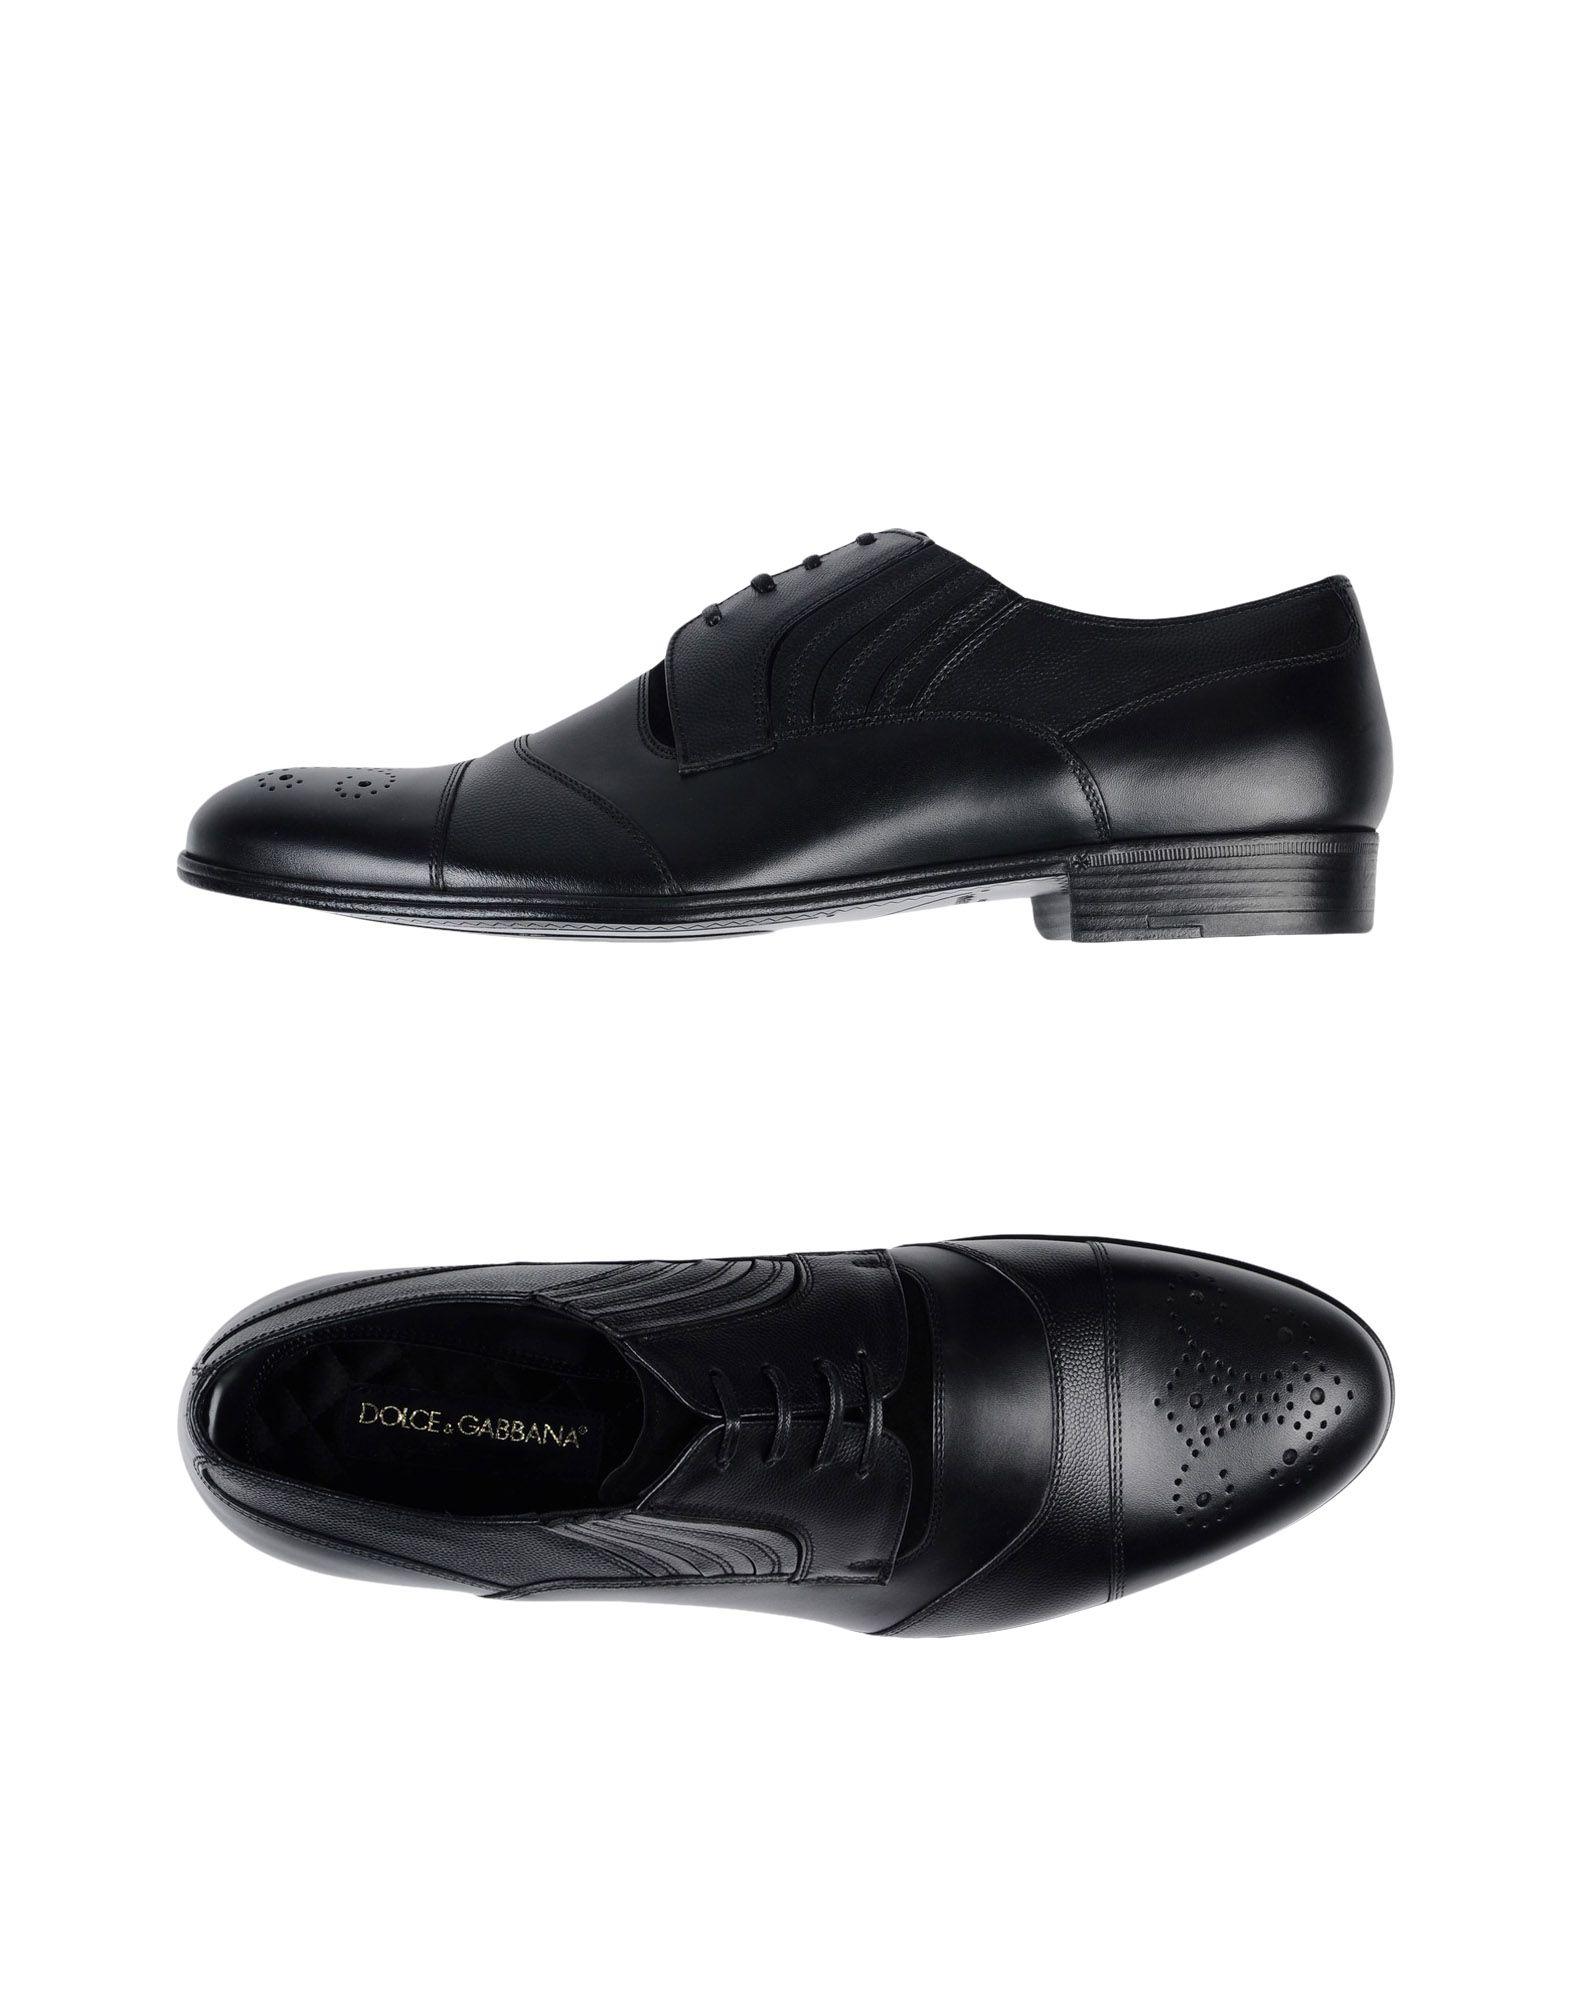 Stringate - Dolce & Gabbana Uomo - Stringate 11407120WT a8d6dd